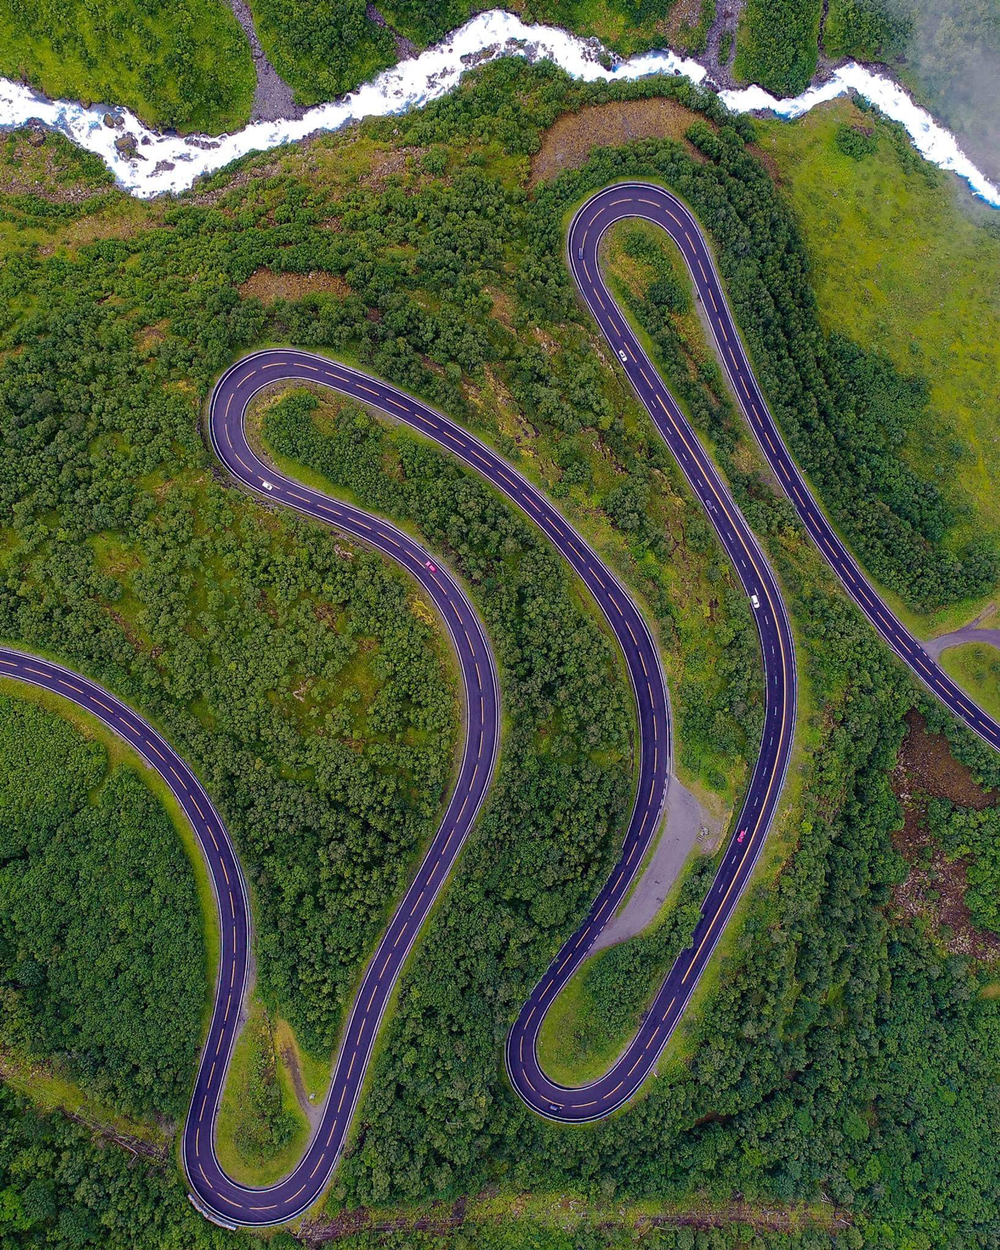 aerial-view-drone-river-trees-duprat-unsplash.png